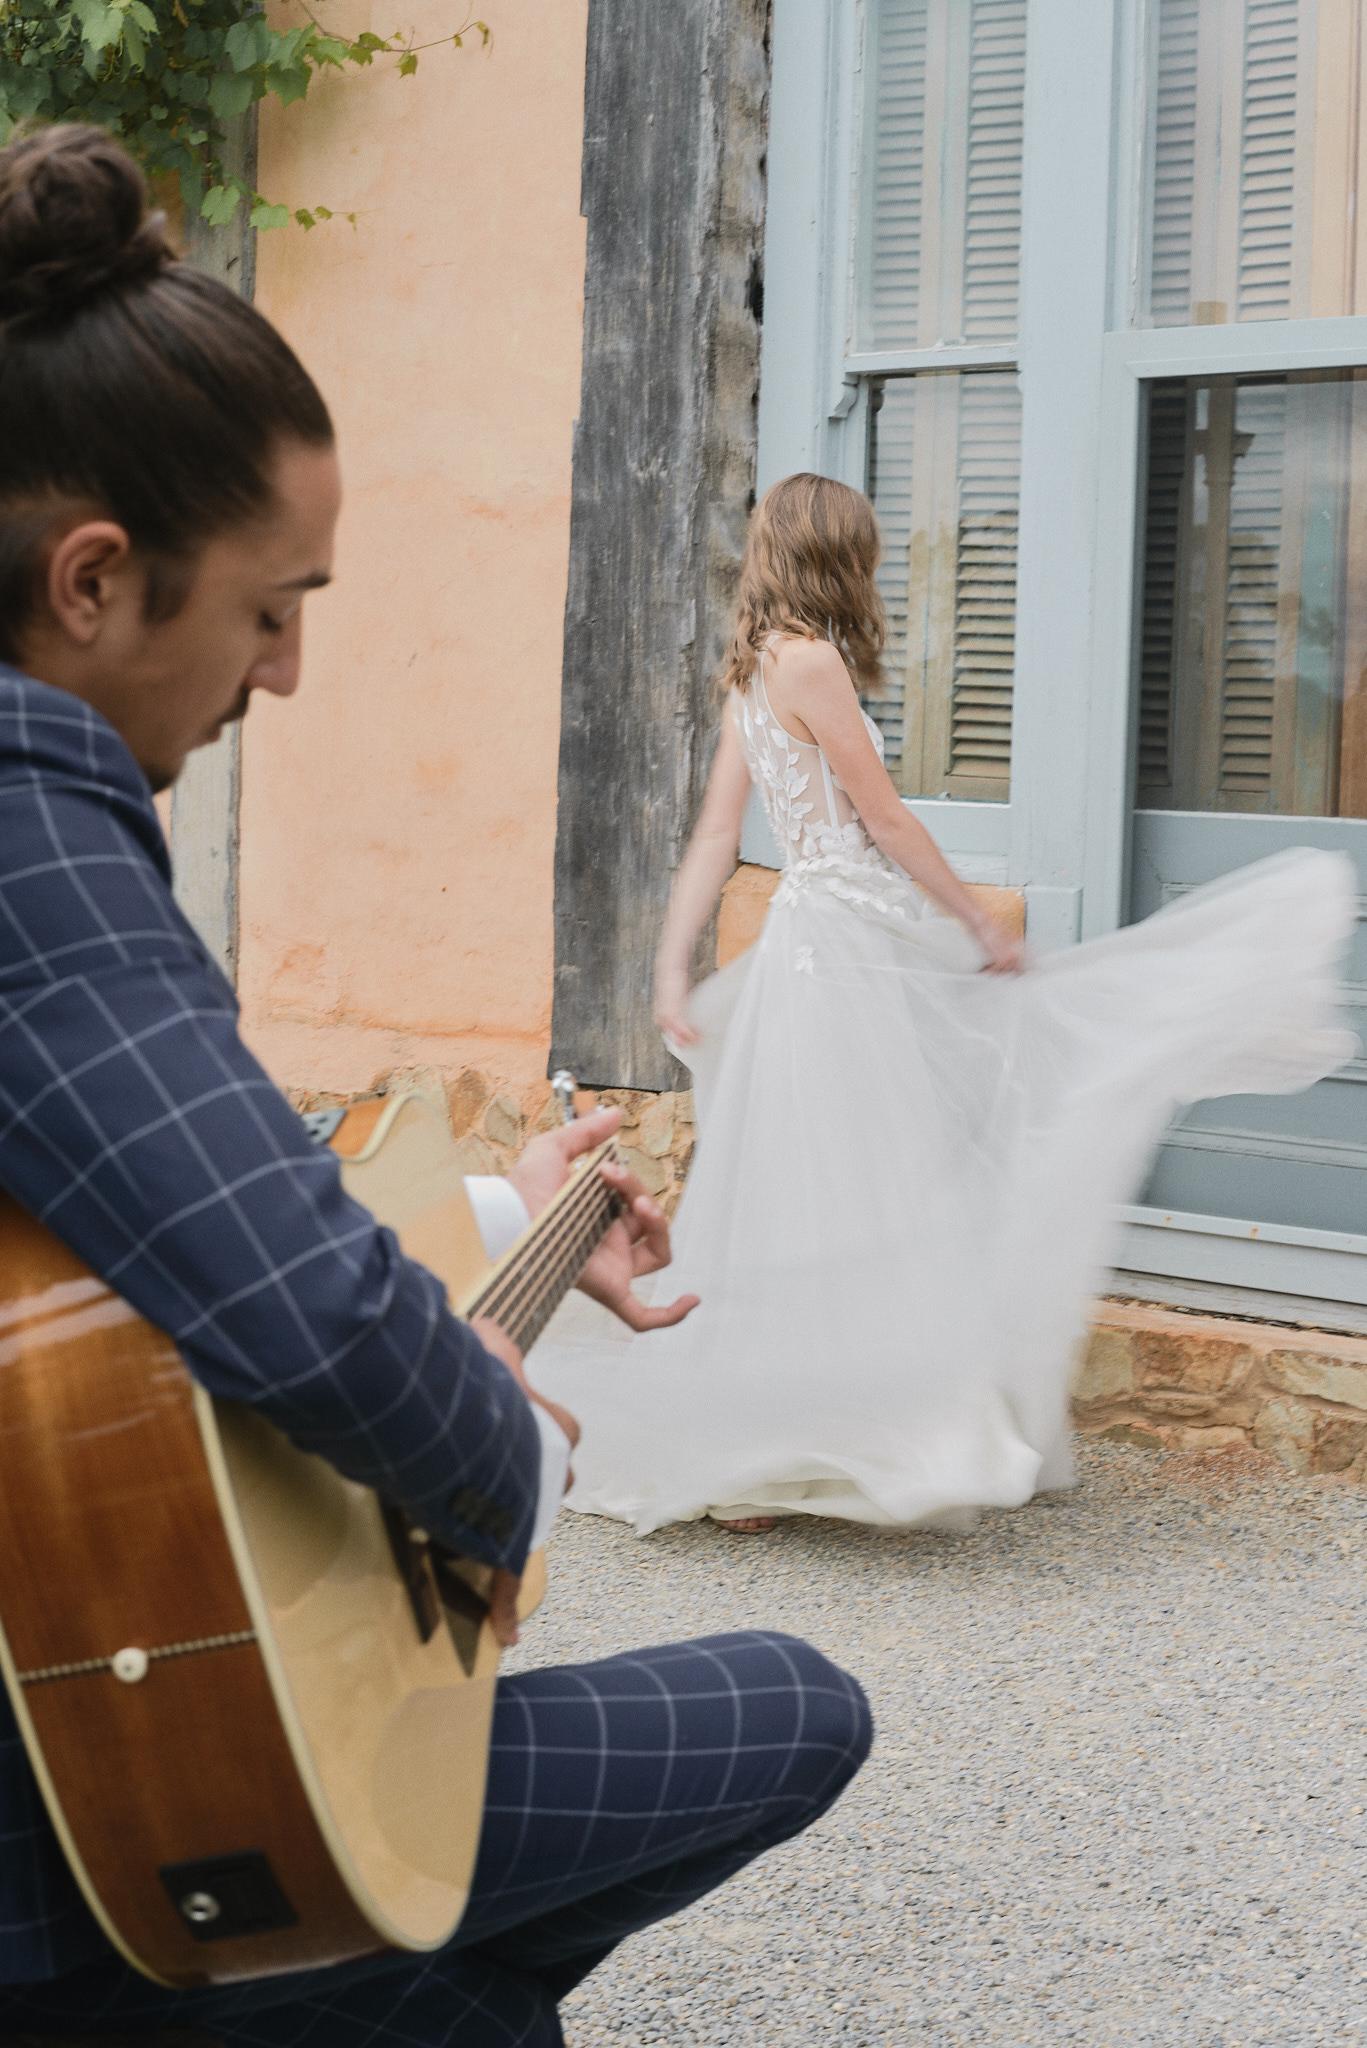 Sephory Photography - Romance is not dead 031 - Web.jpg